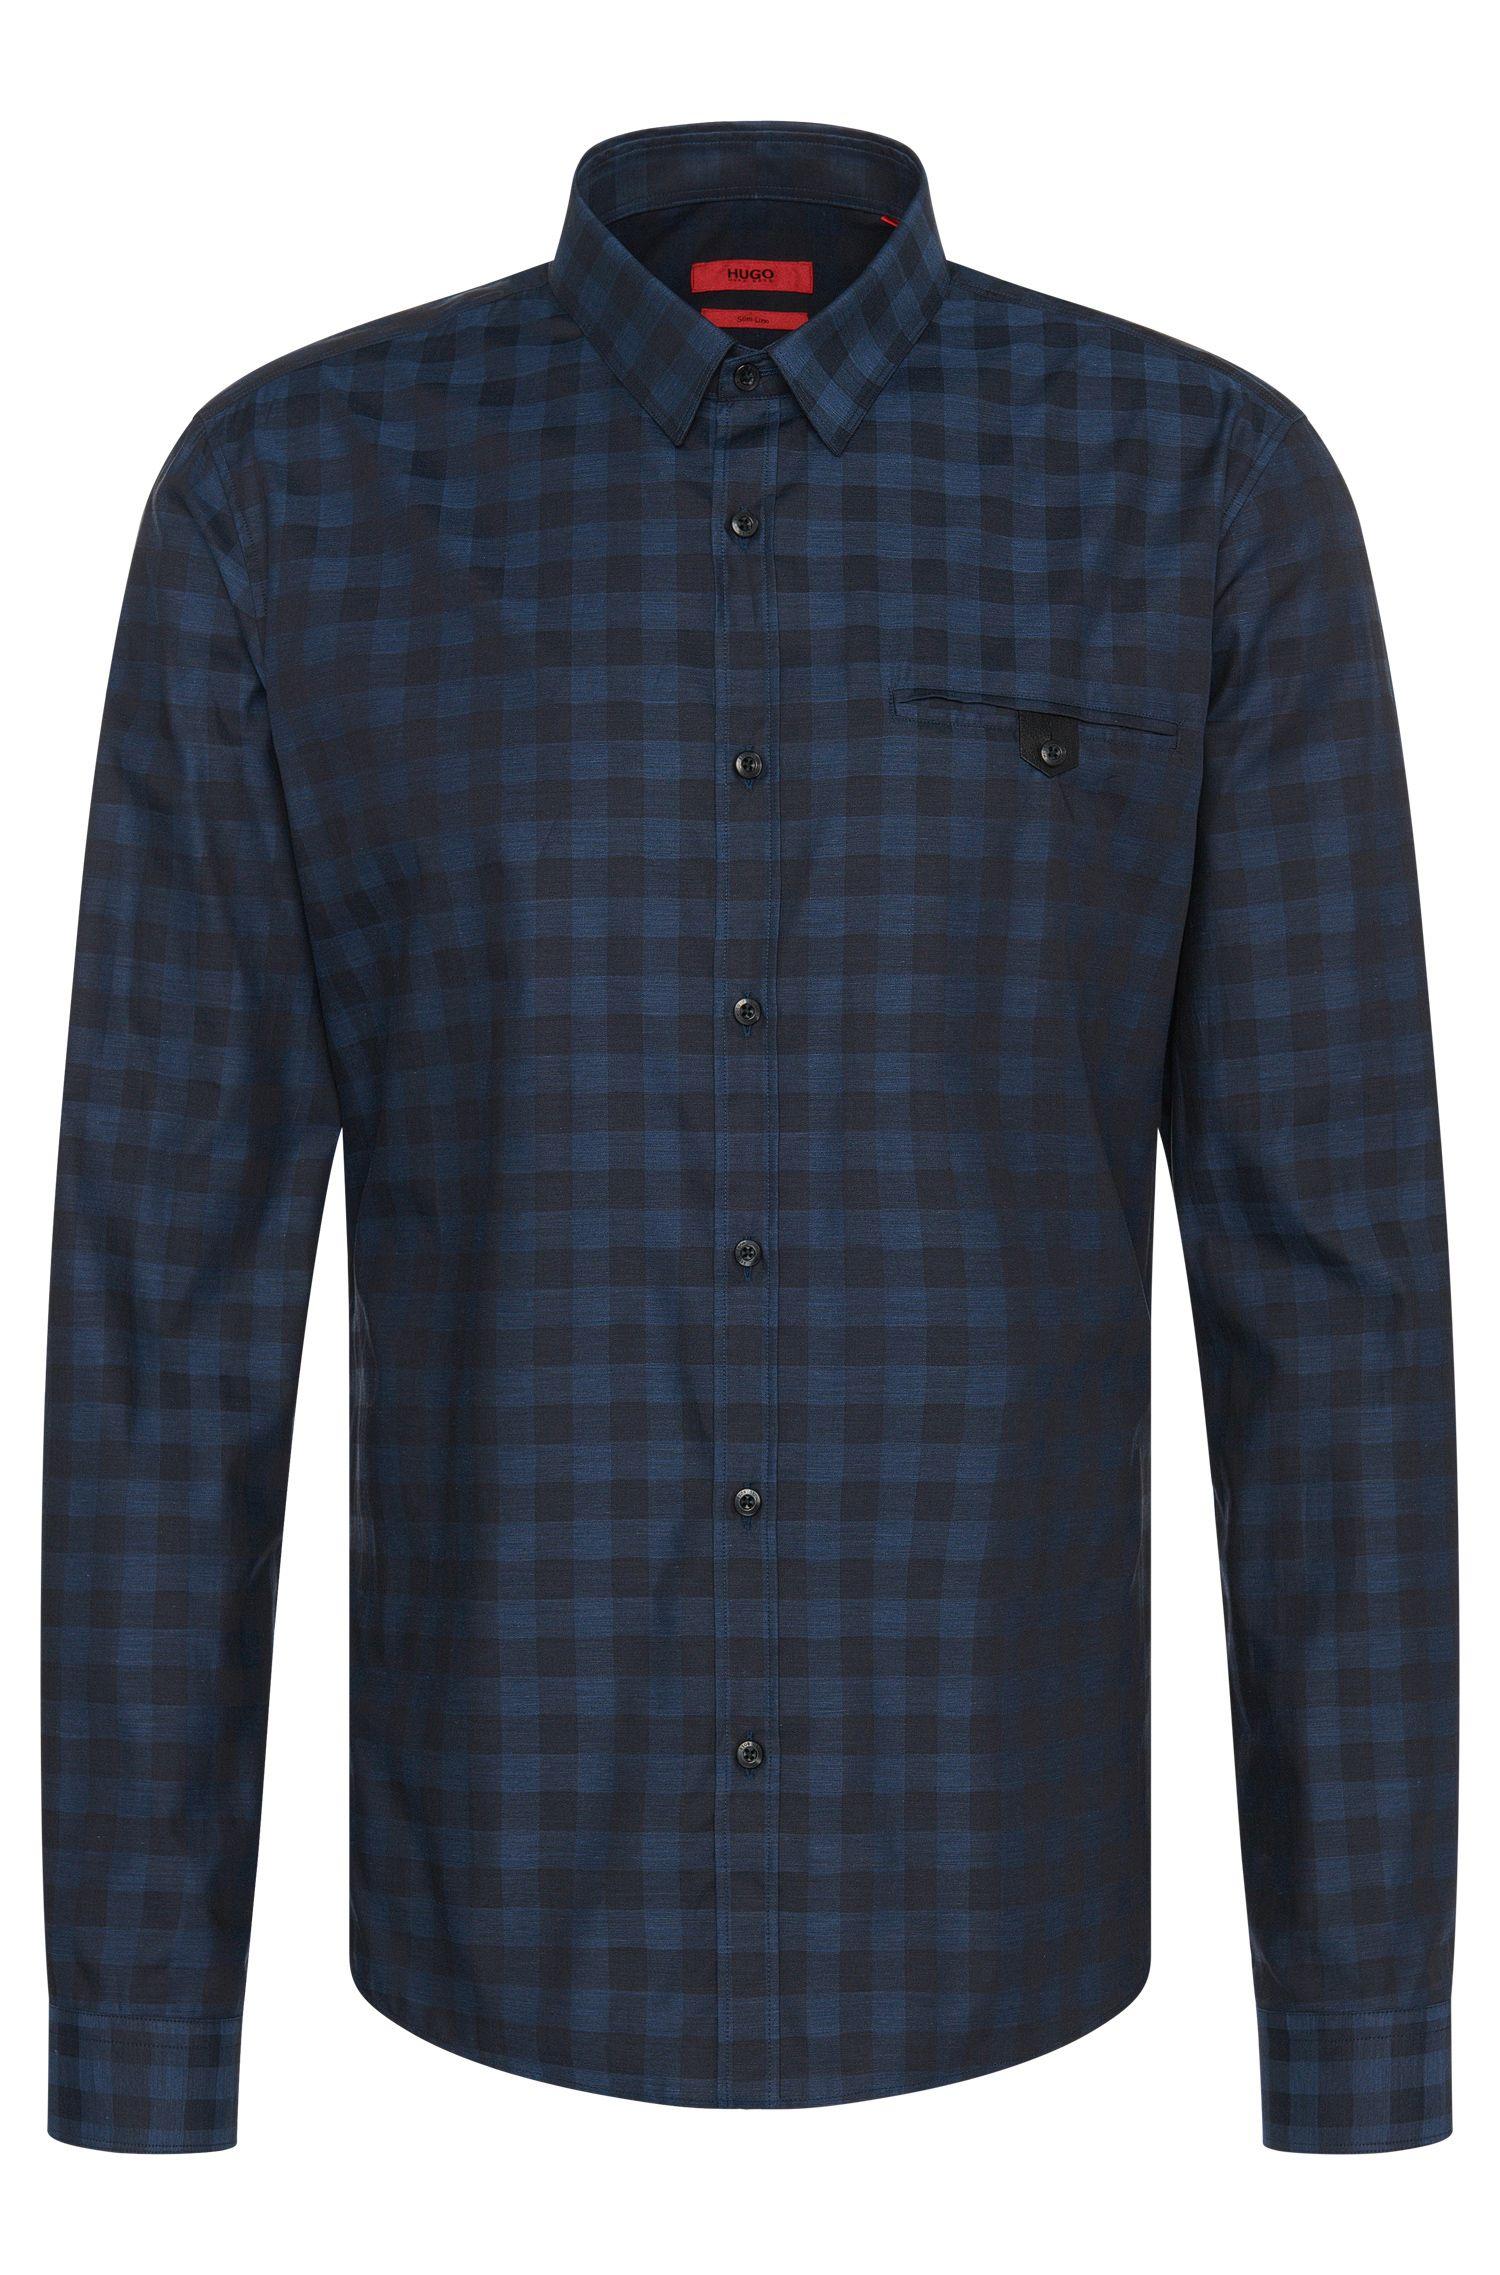 'Ewaldo' | Slim Fit, Cotton Melange Gingham Button Down Shirt